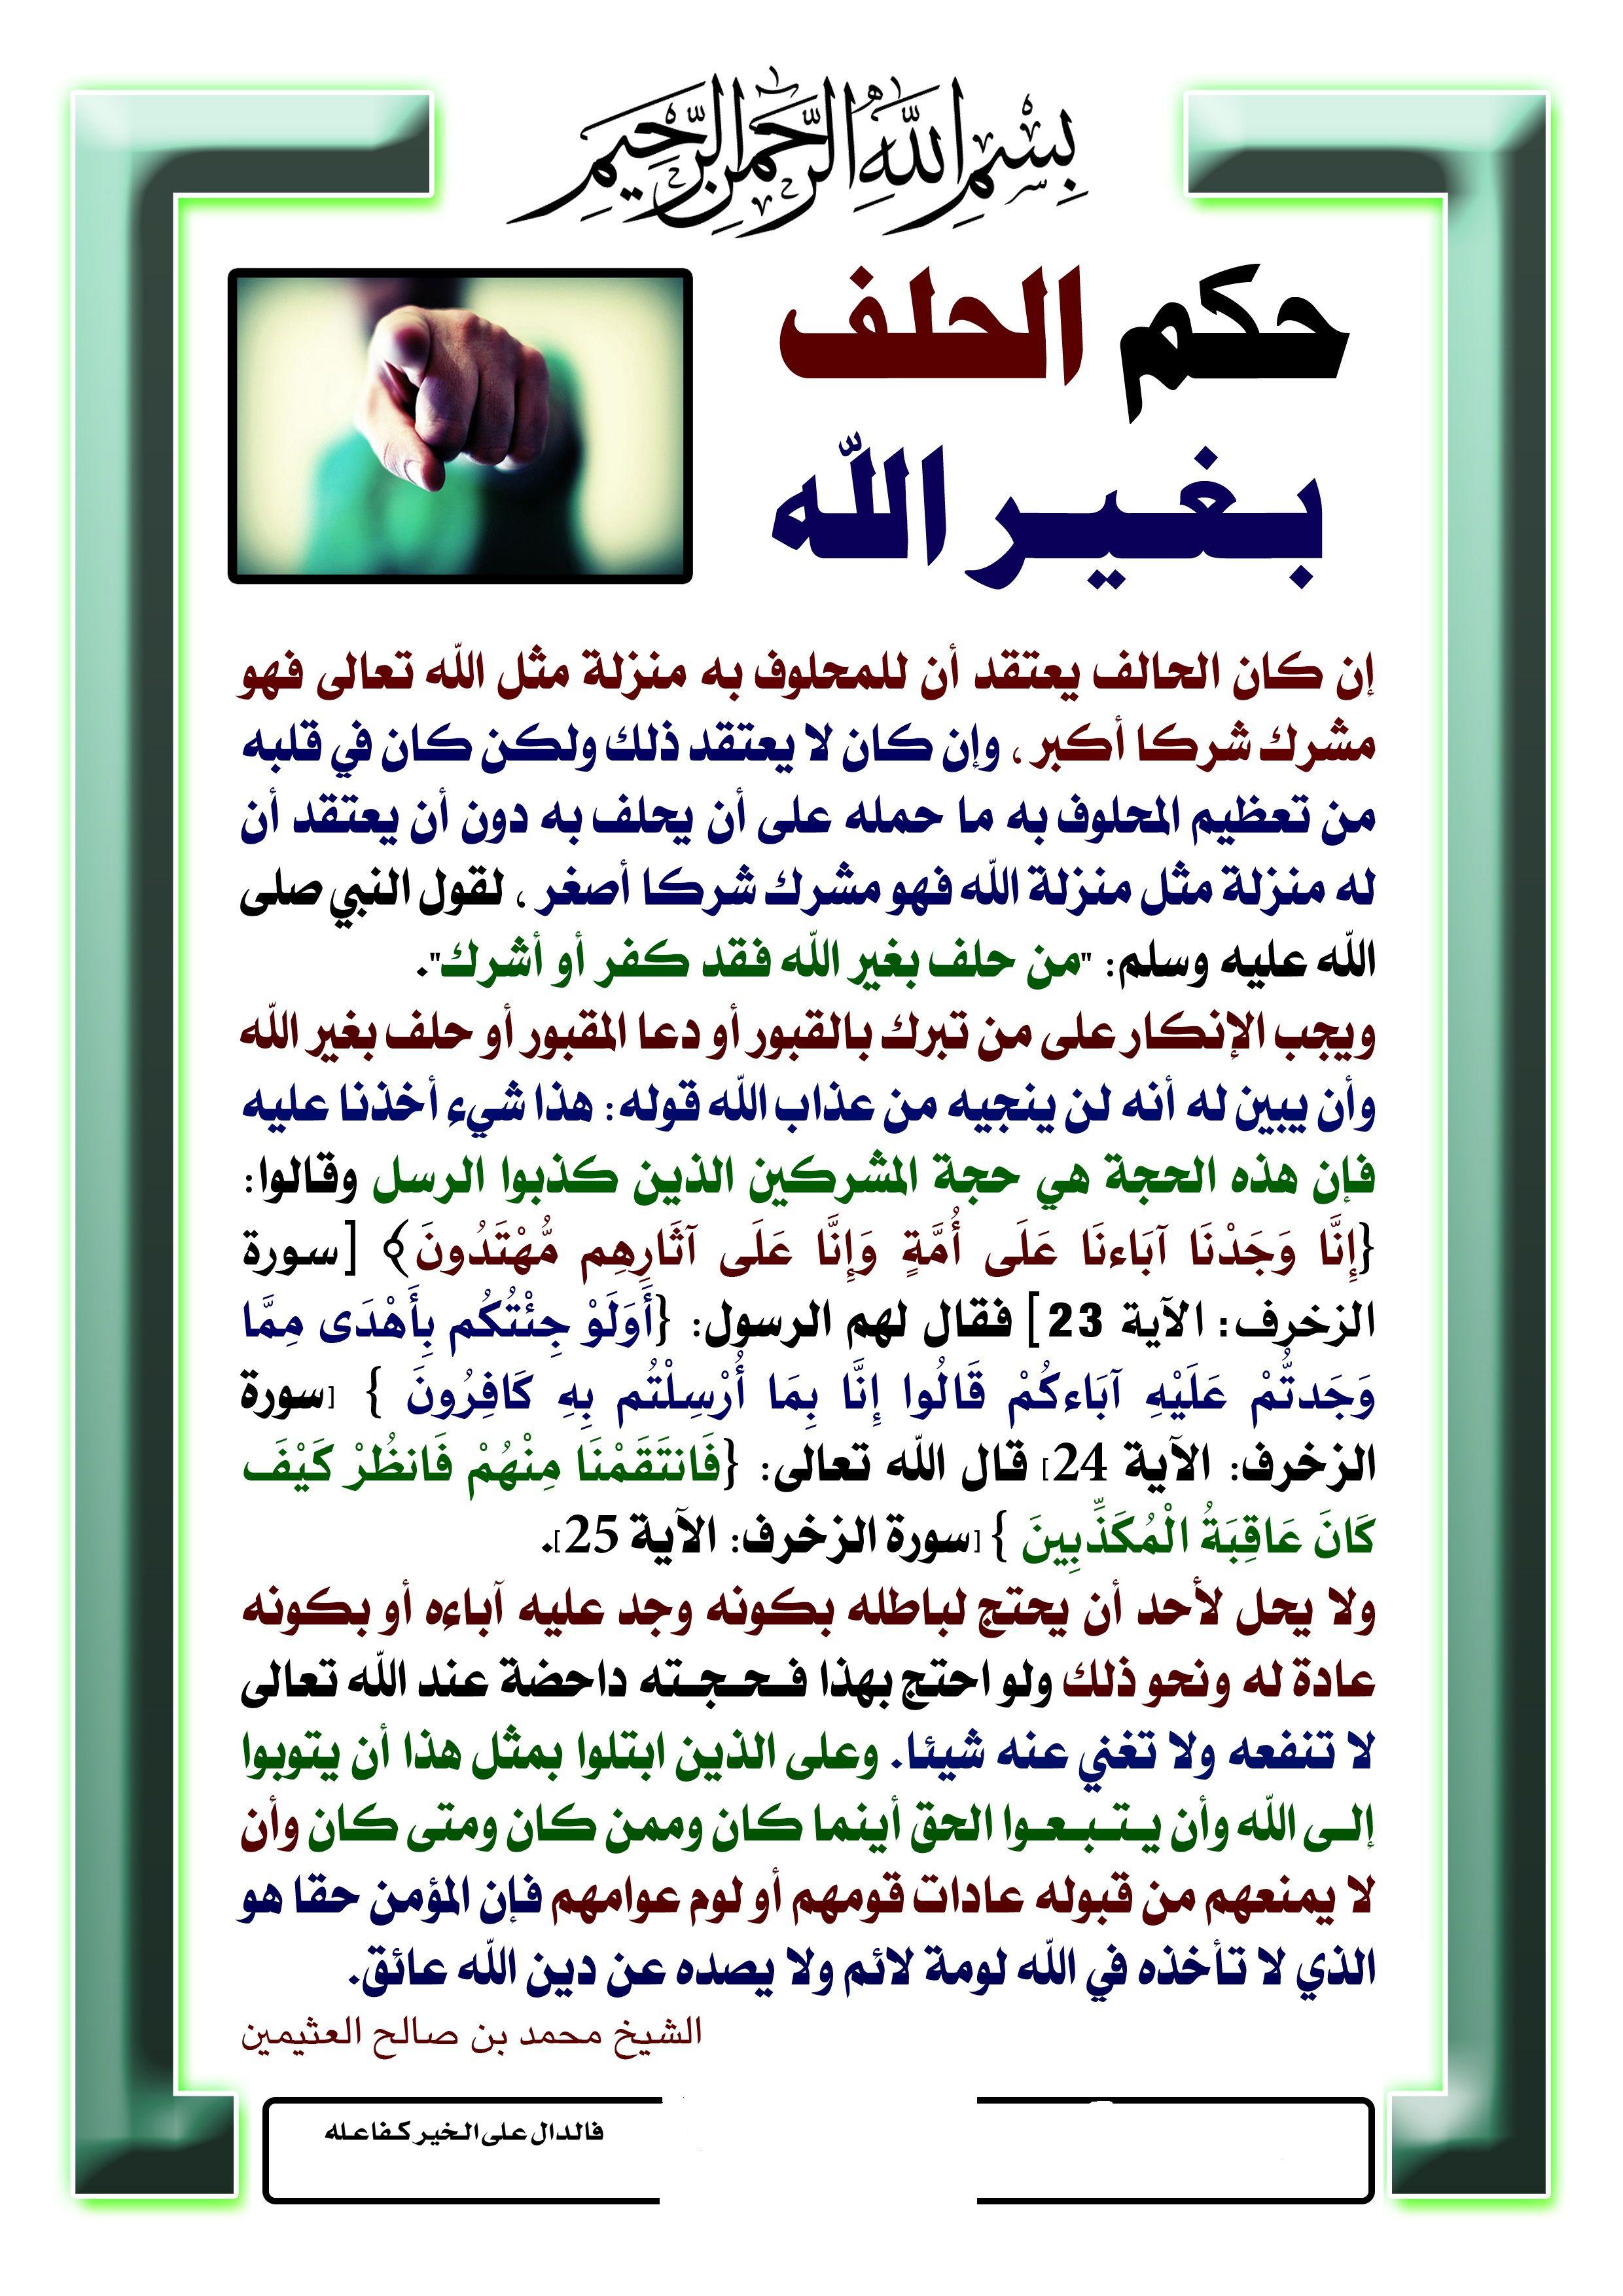 Pin By الدعوة إلى الله On أحاديث نبوية شريفة صحيحة عن اليمين الغموس Home Decor Decor Frame